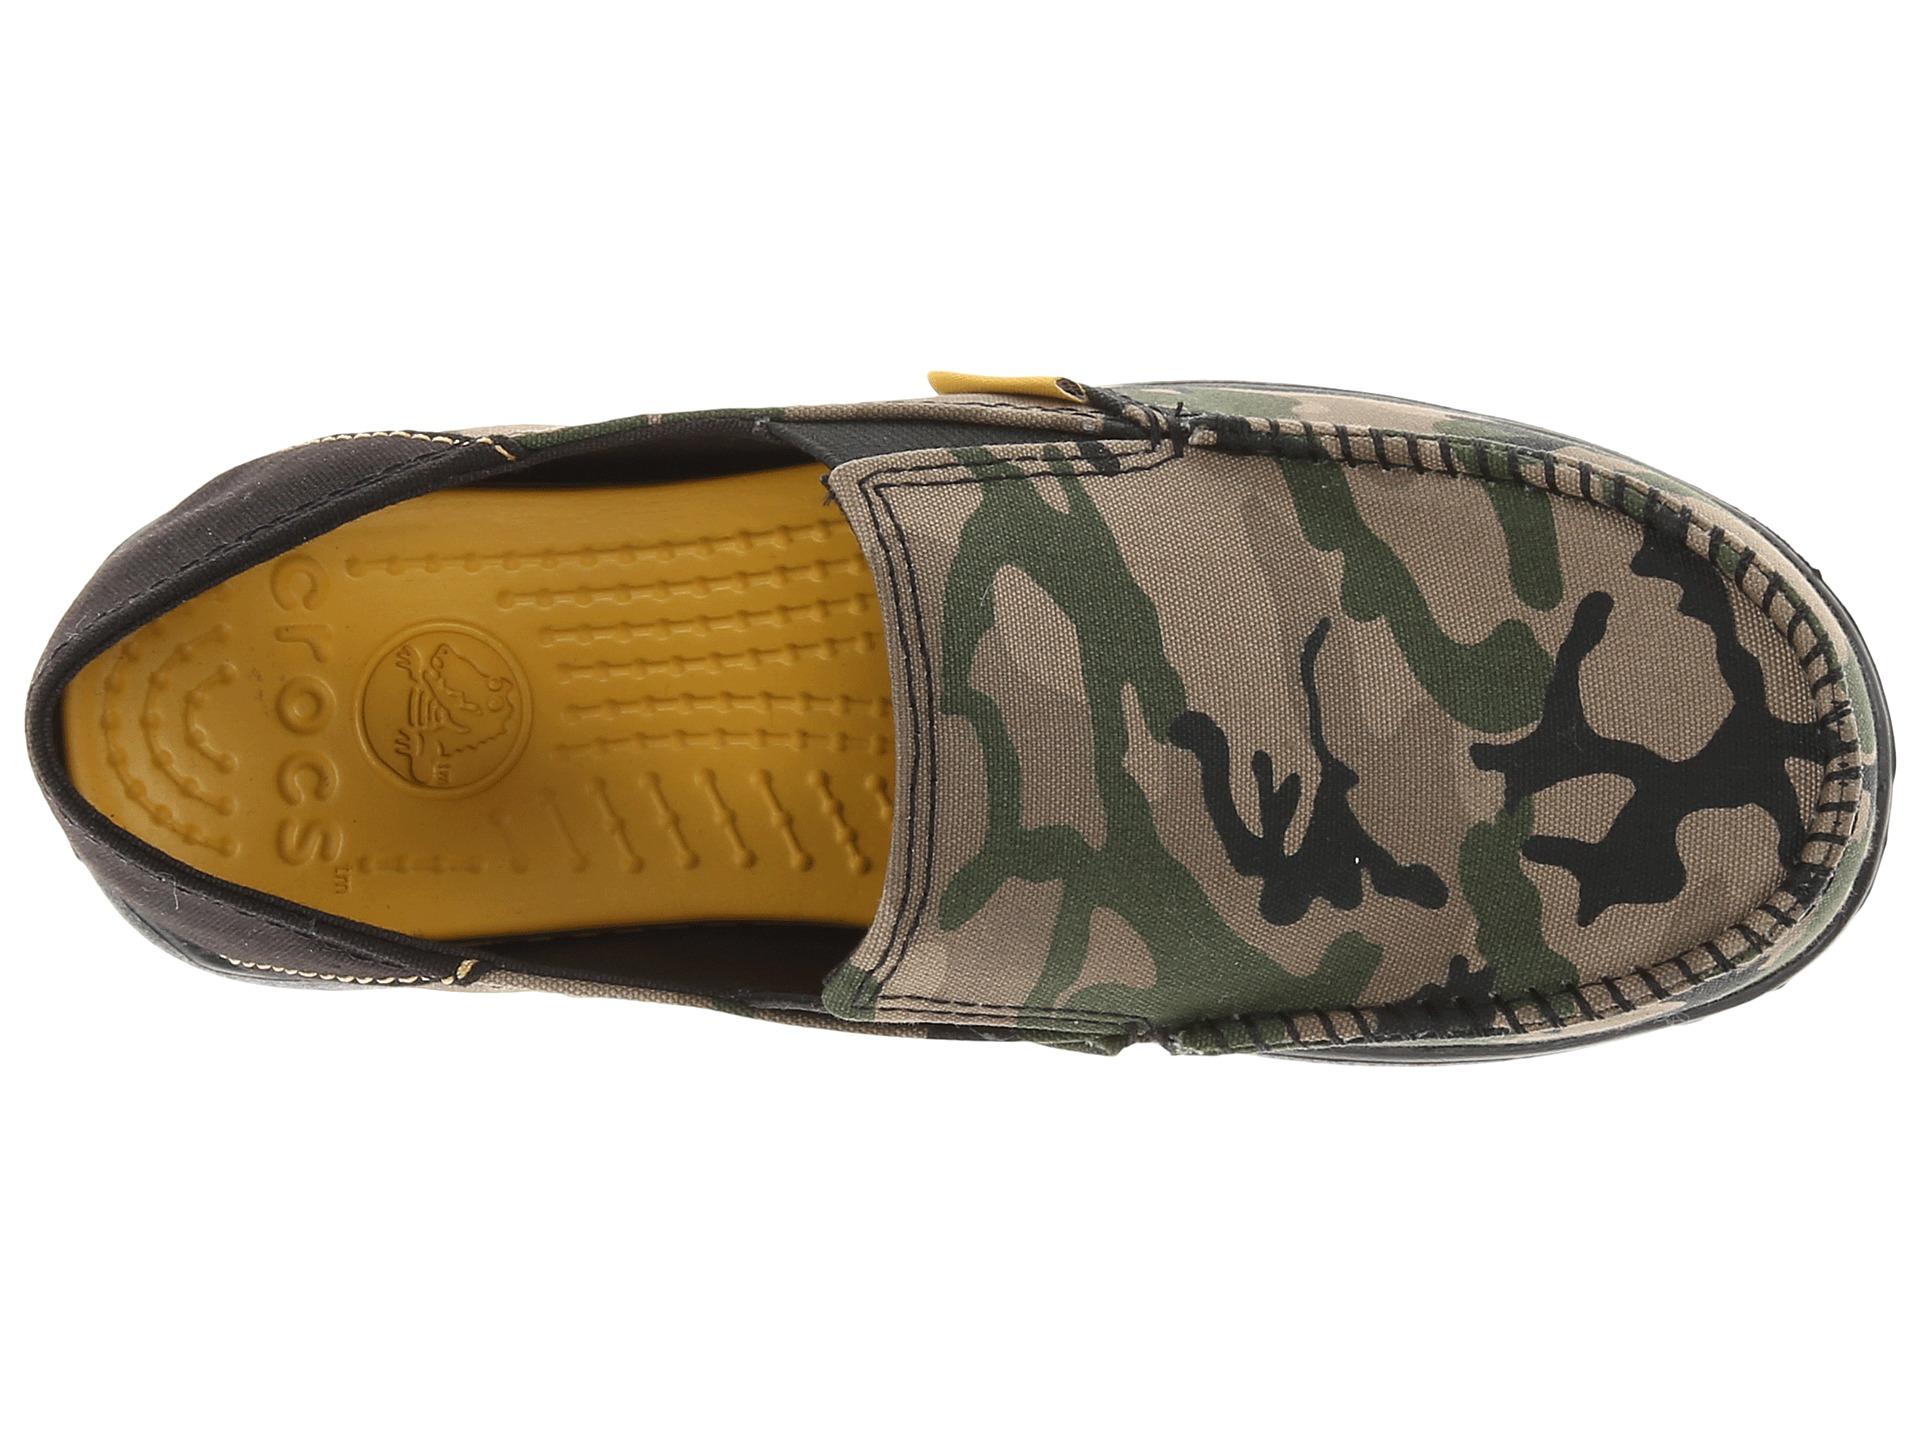 Custom Loafers For Men Images Black And White Mens